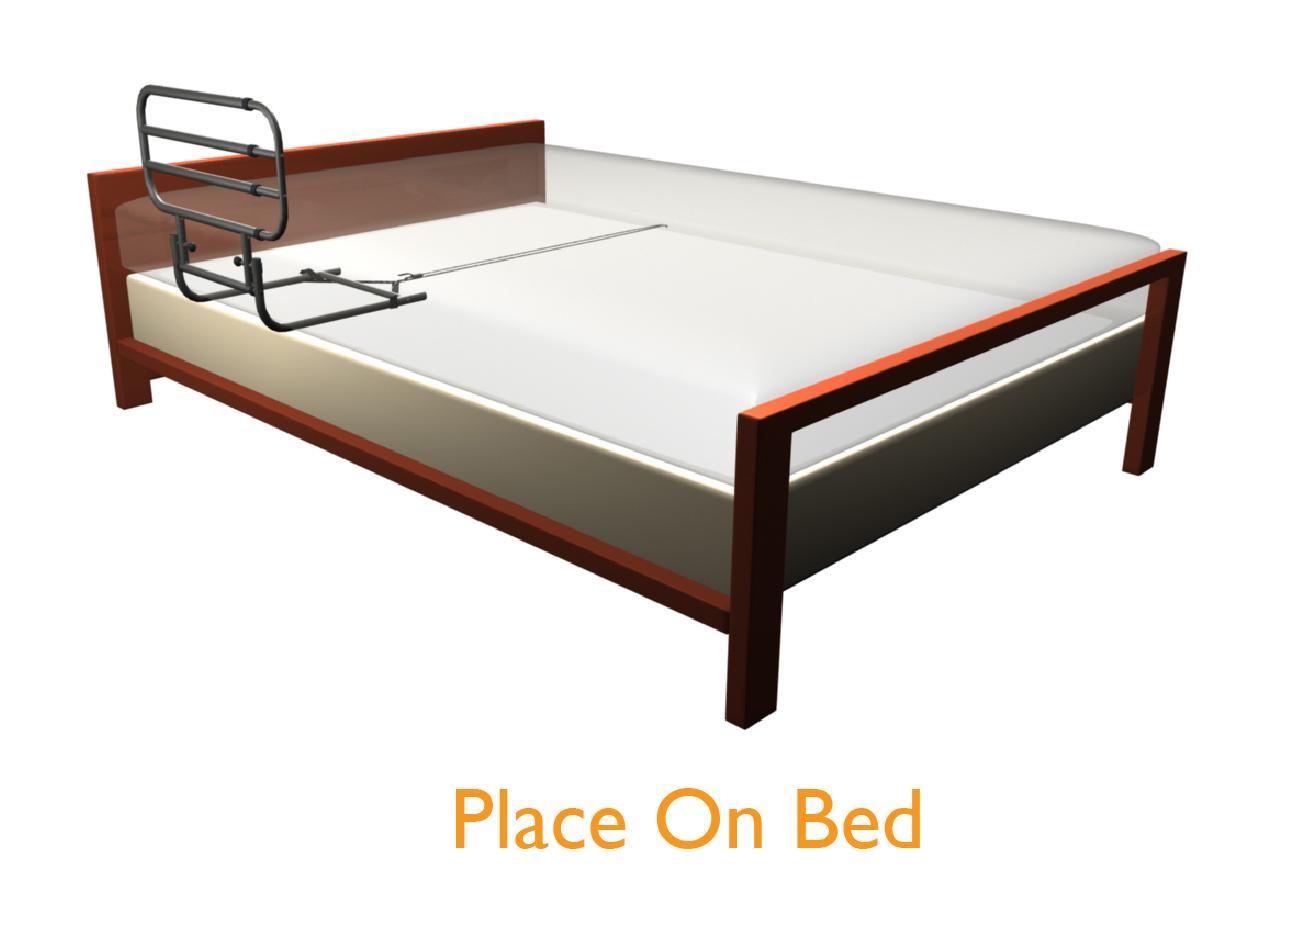 Amazon.com: Stander EZ Adjust & Pivoting Home Bed Rail + 3 ...